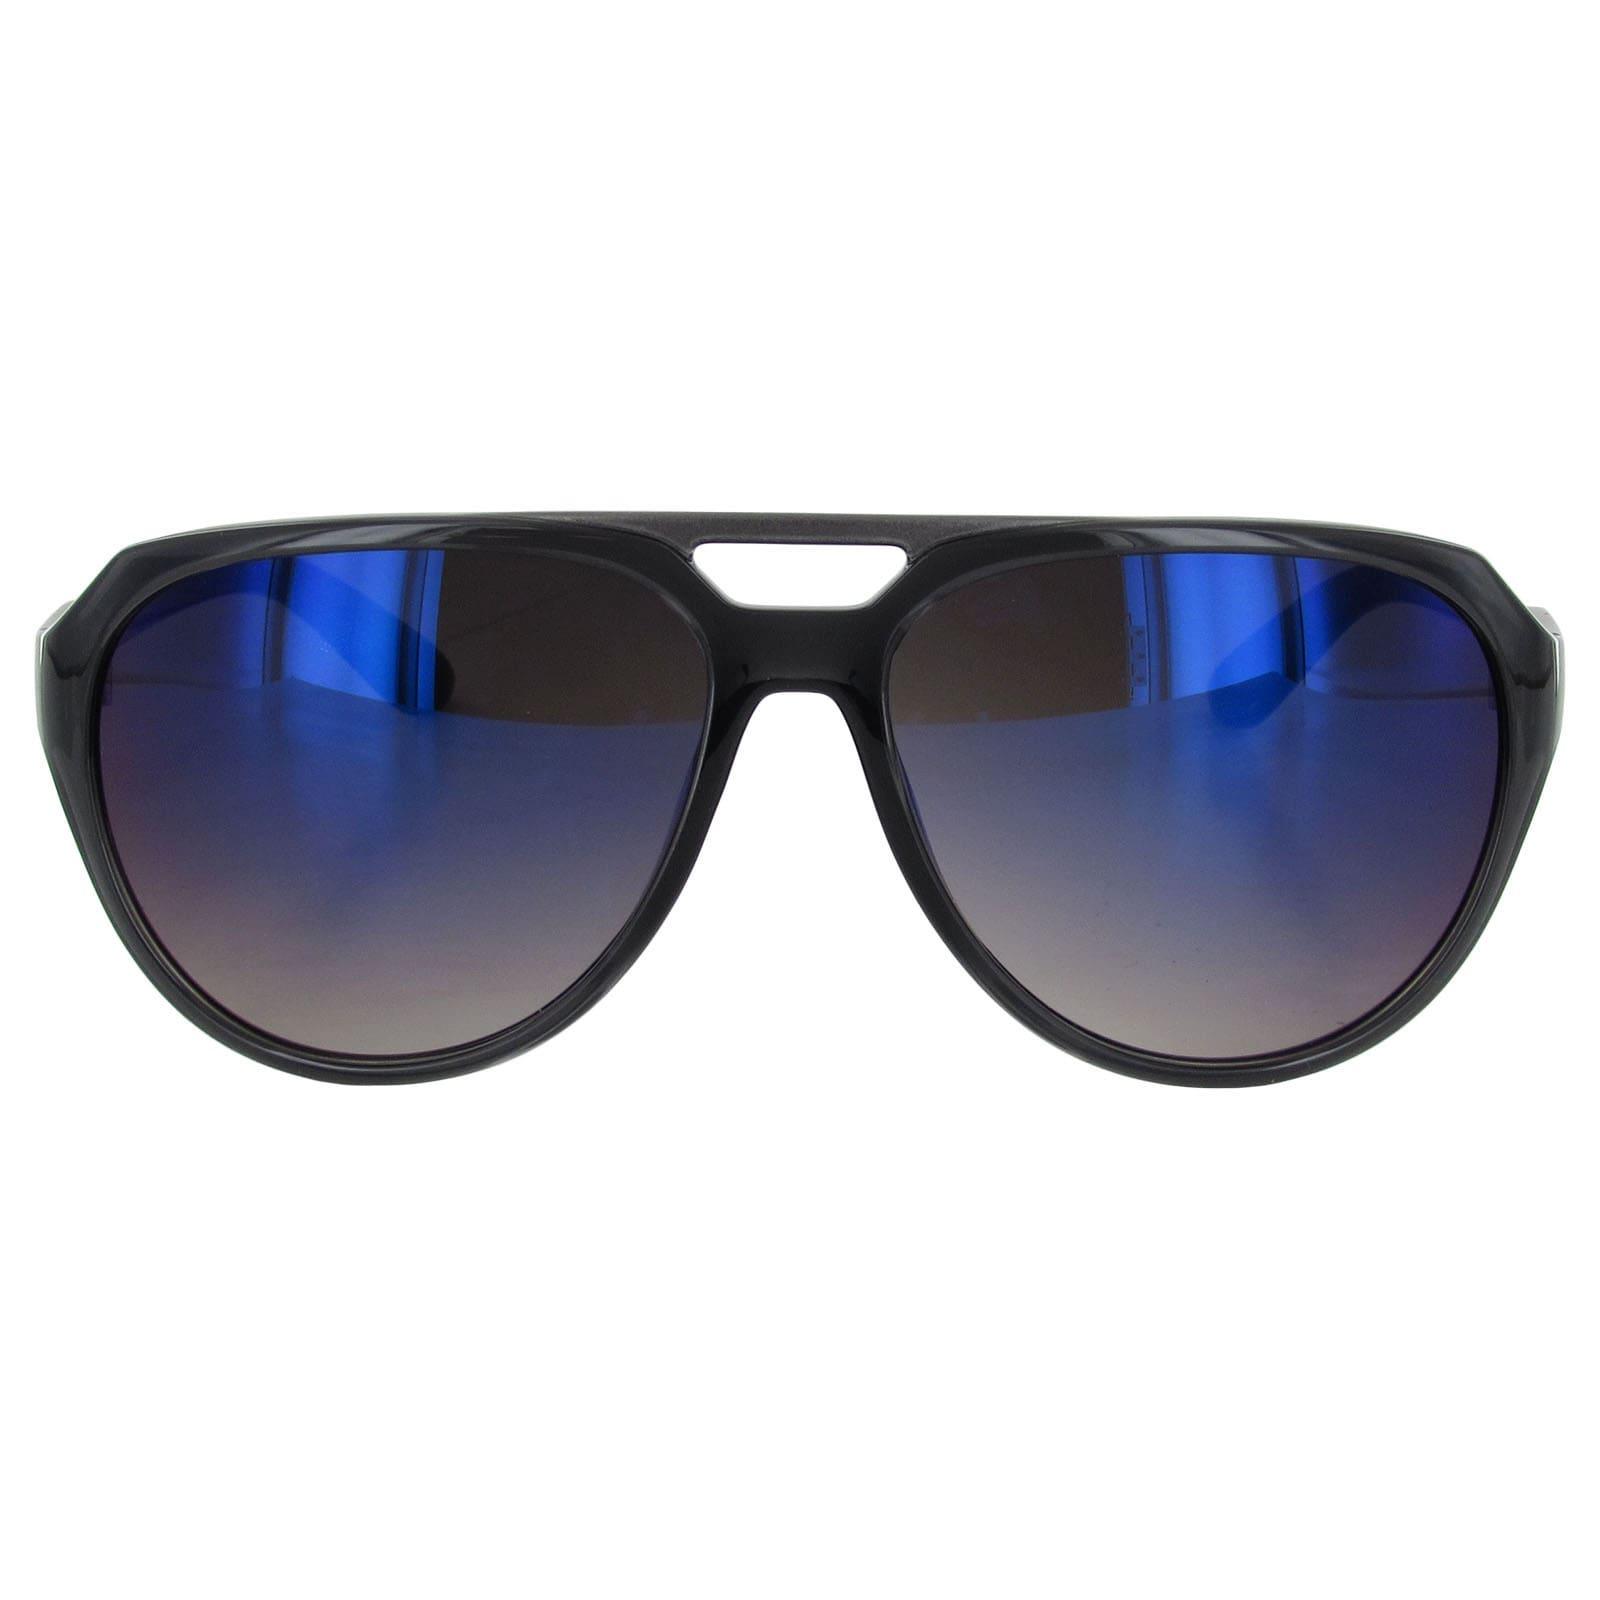 64f234010953e1 Shop Vuarnet Men s Extreme VE5009 Medium Aviator Sunglasses - Free Shipping  On Orders Over  45 - Overstock.com - 9766021